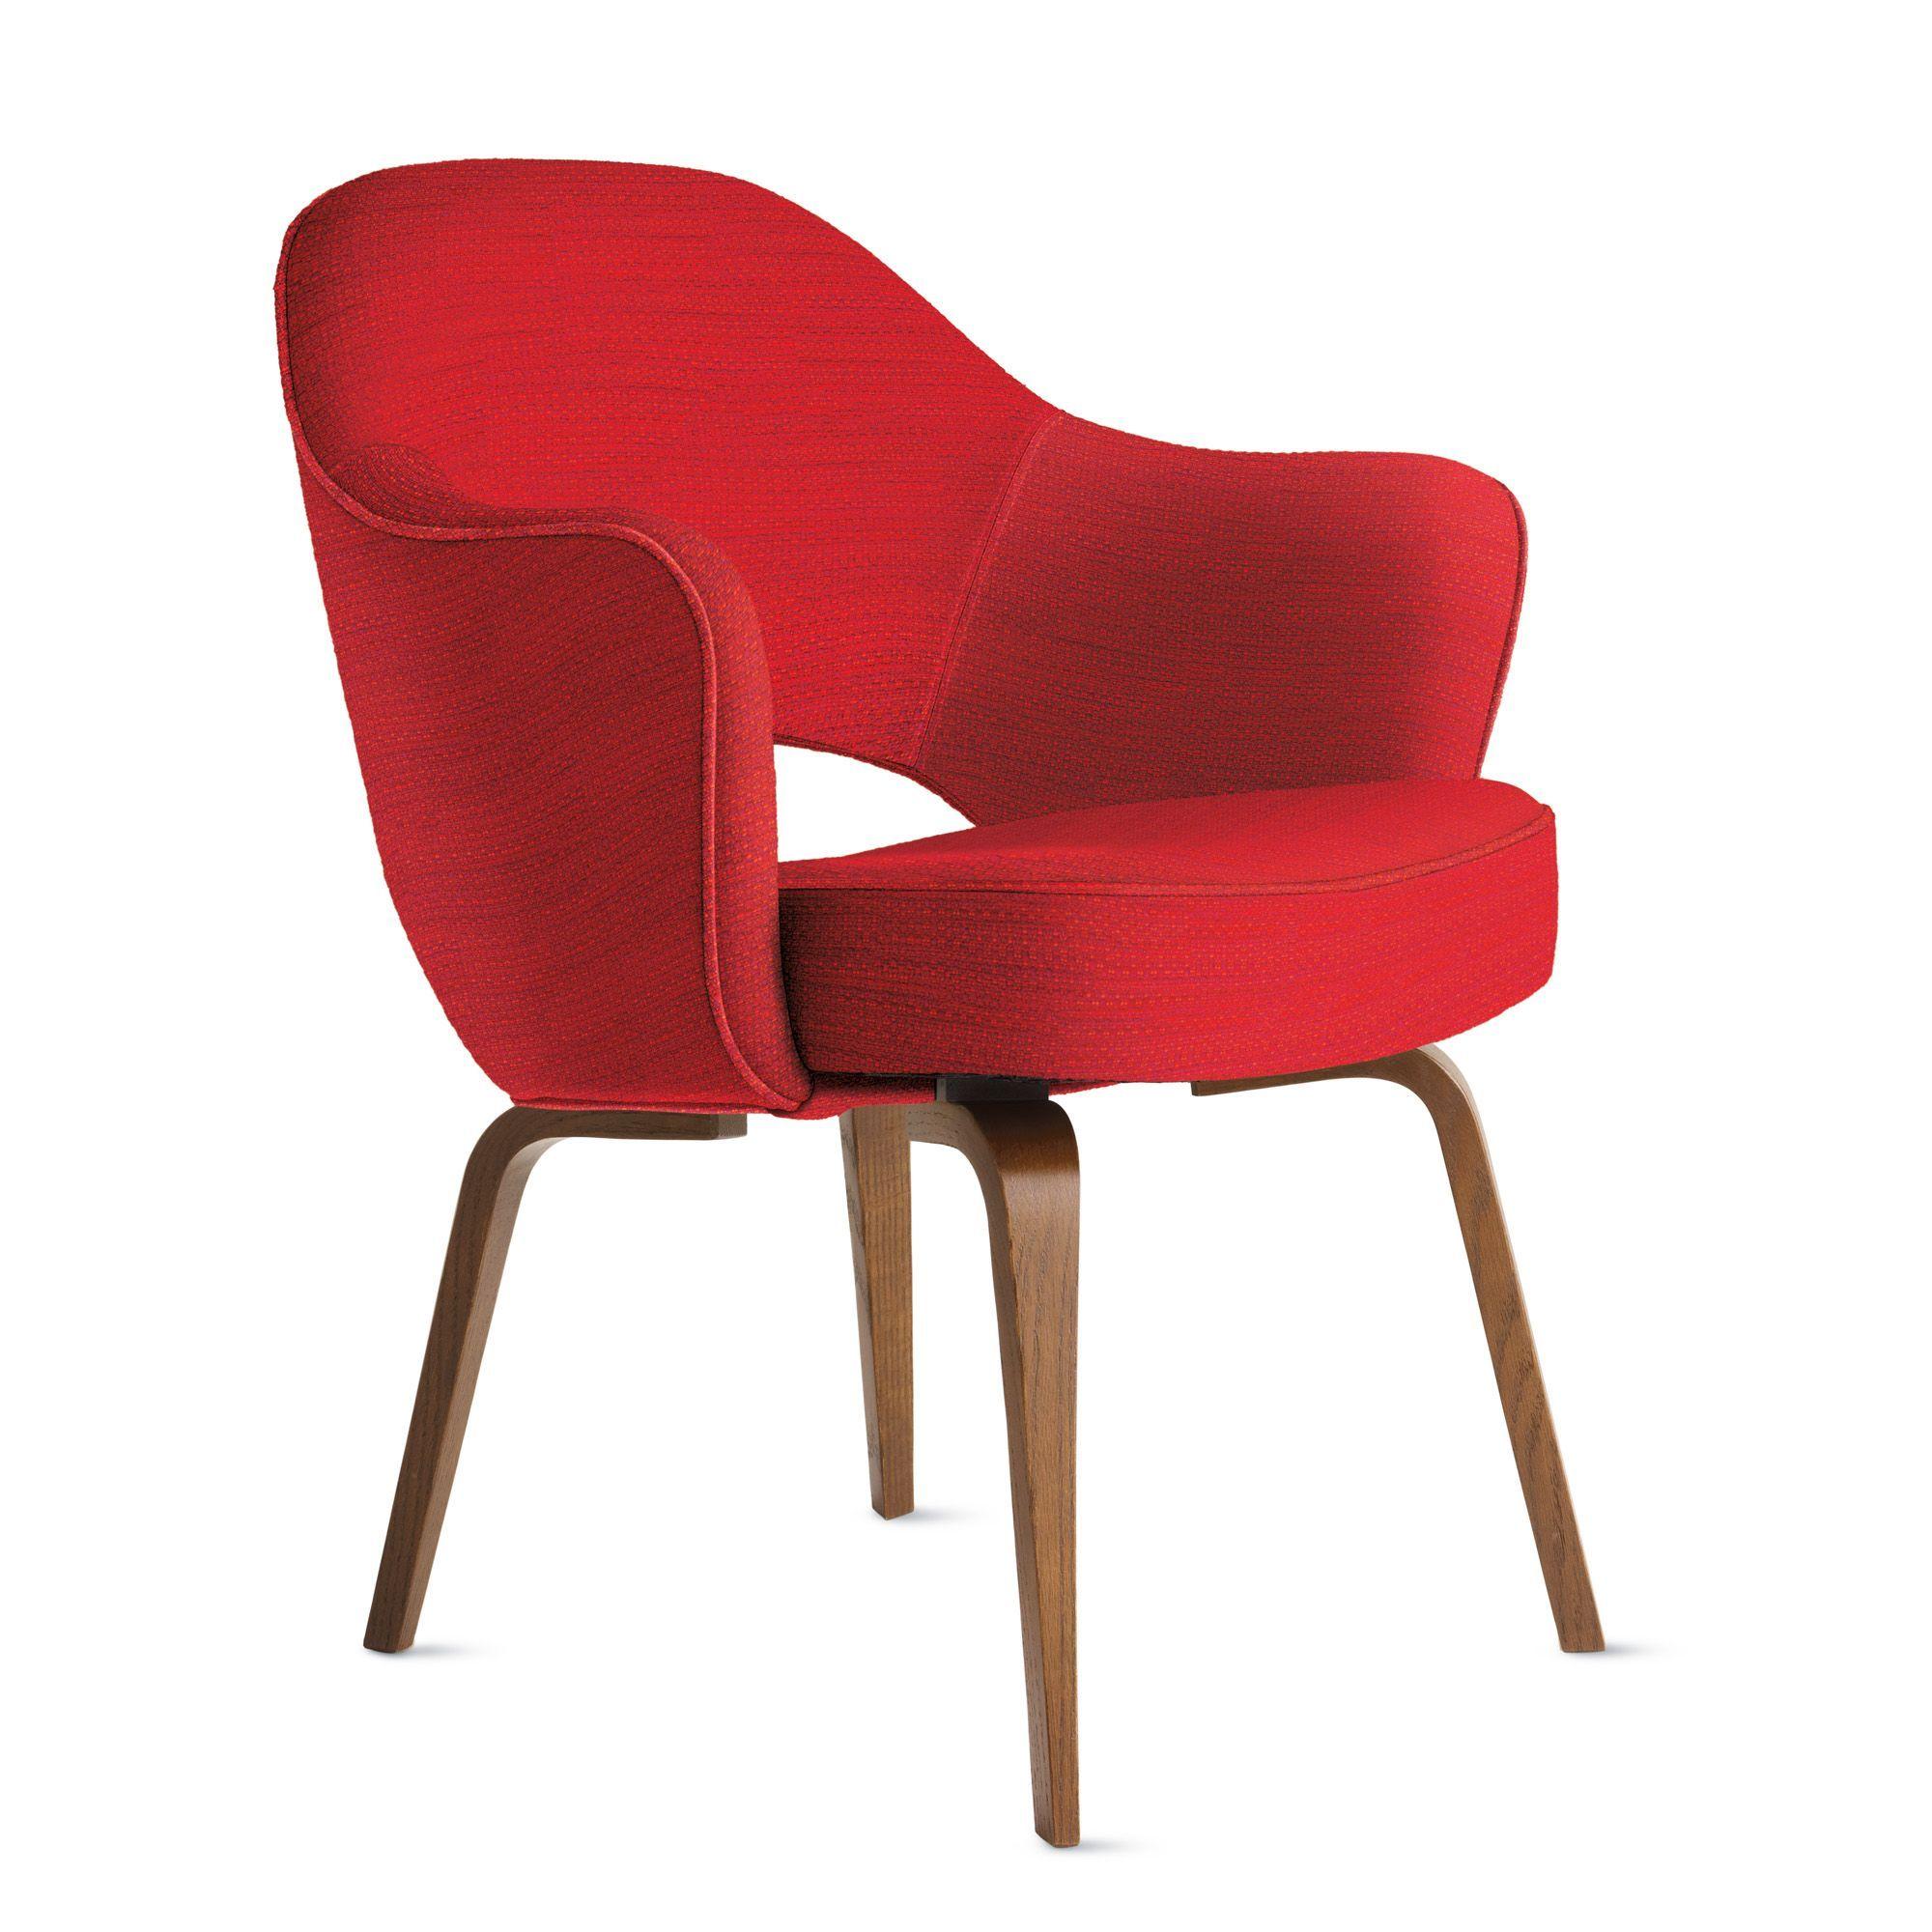 Saarinen Executive Armchair with Wood Legs | Wood legs ...